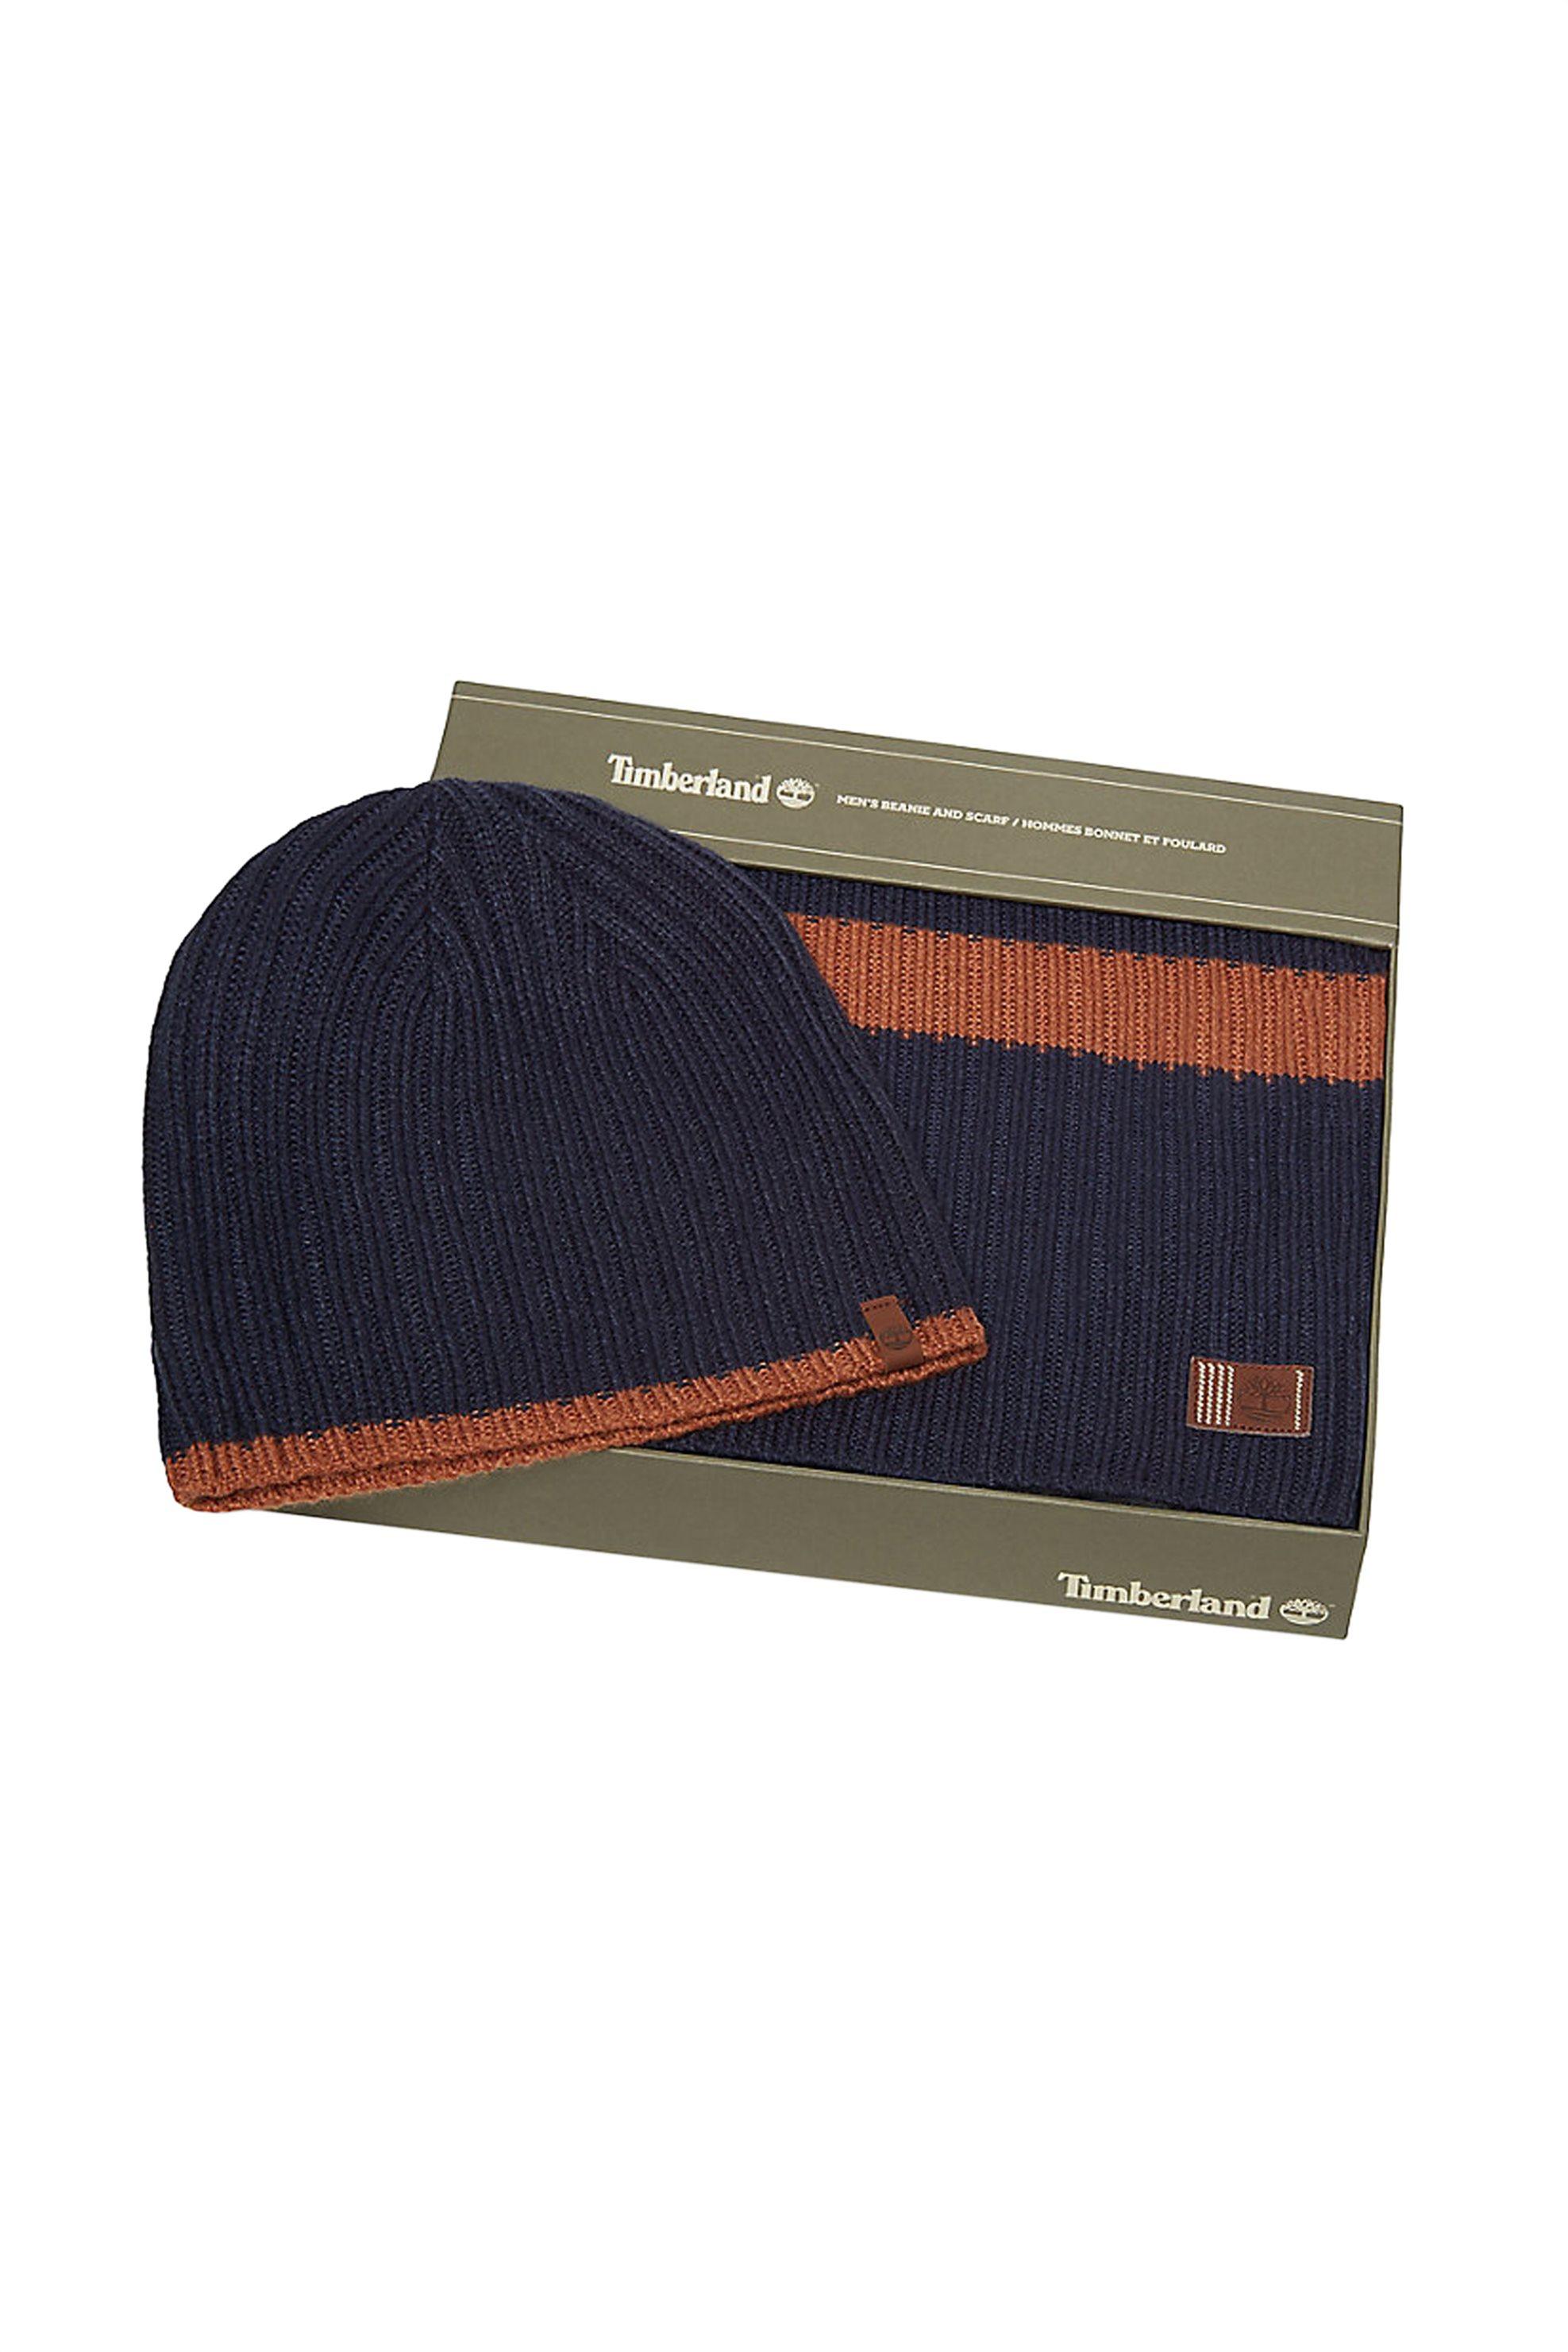 Timberland ανδρικό σετ σκούφος και κασκόλ Ripped Stripe - TB0A1EH7TB91 - Μπλε Σκ ανδρασ   αξεσουαρ   κασκόλ   μαντήλια    καπέλα   σκούφοι